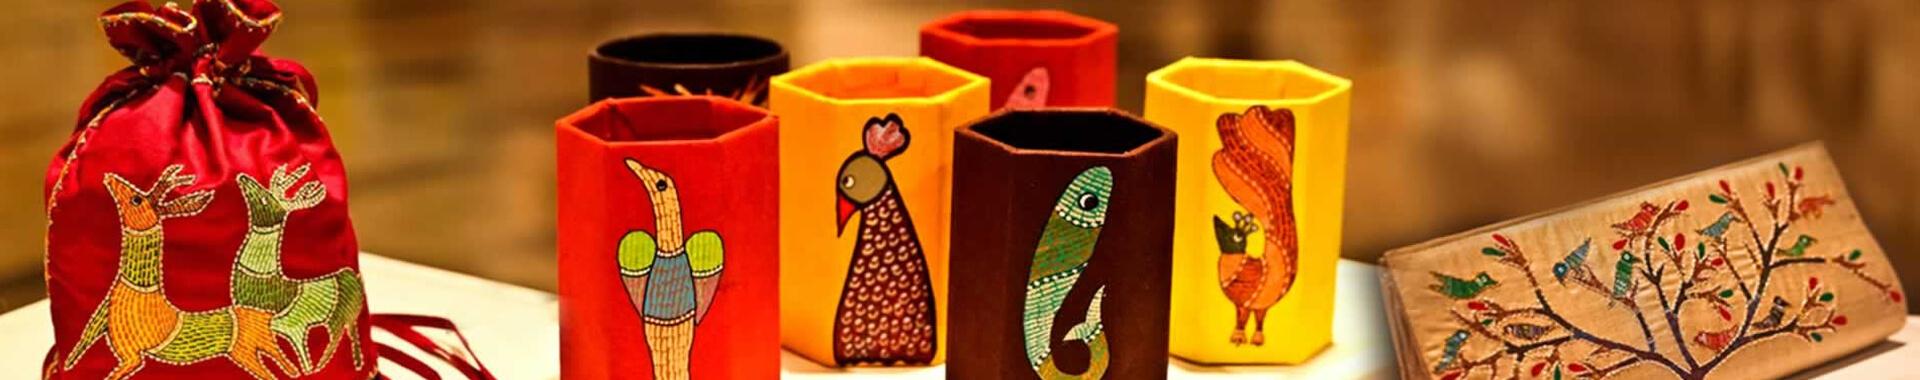 Apna Sambhal Handicrafts List